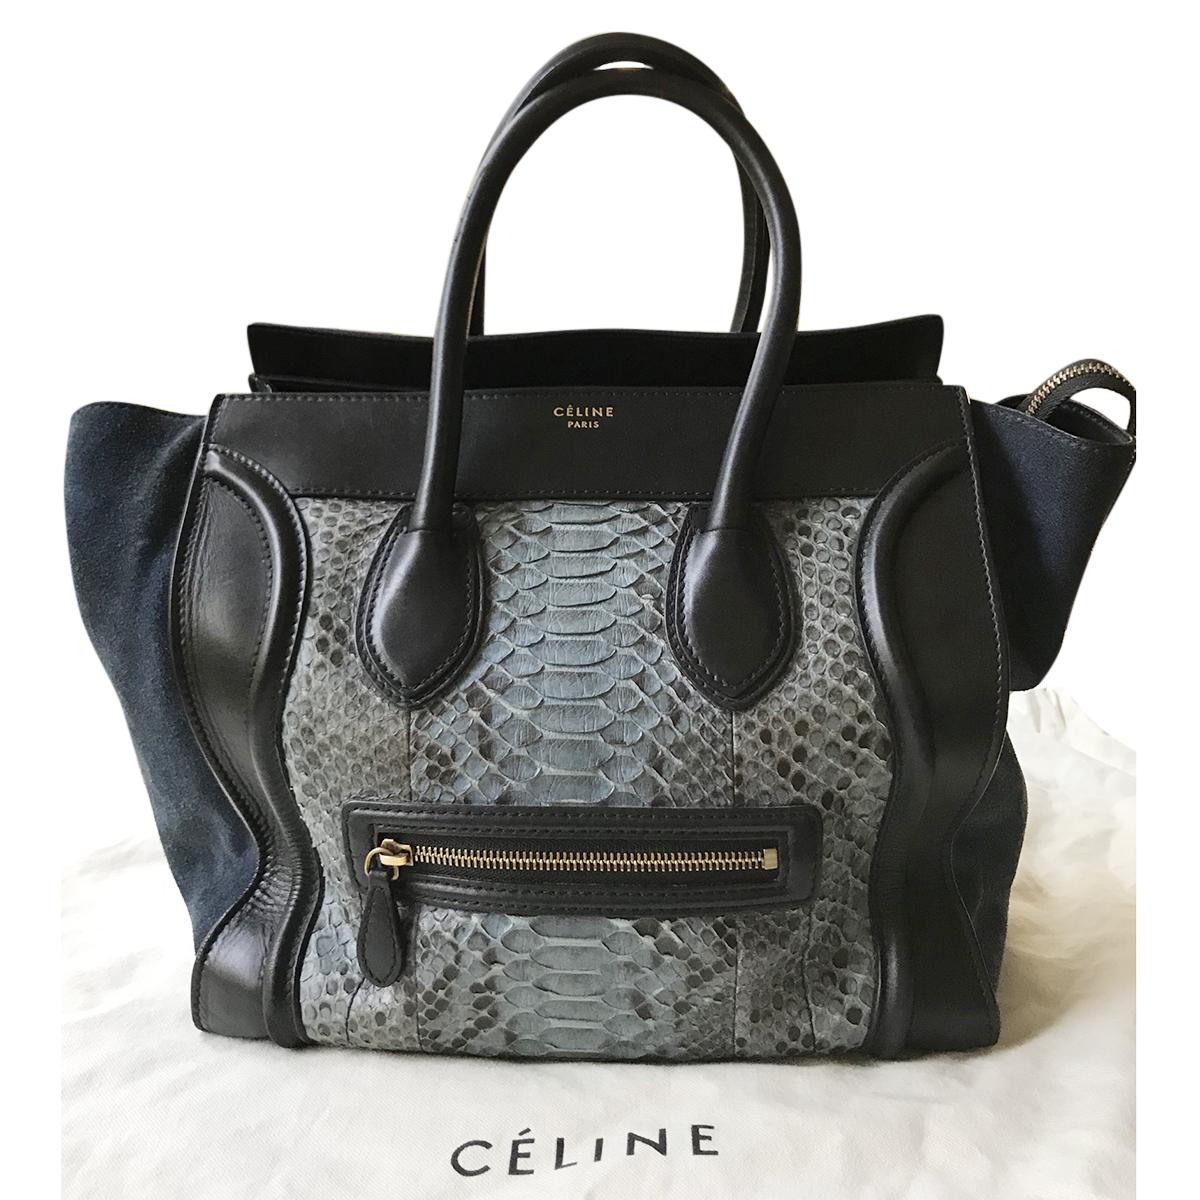 829f27203b47 Celine Dark Blue Python Luggage Tote Bag